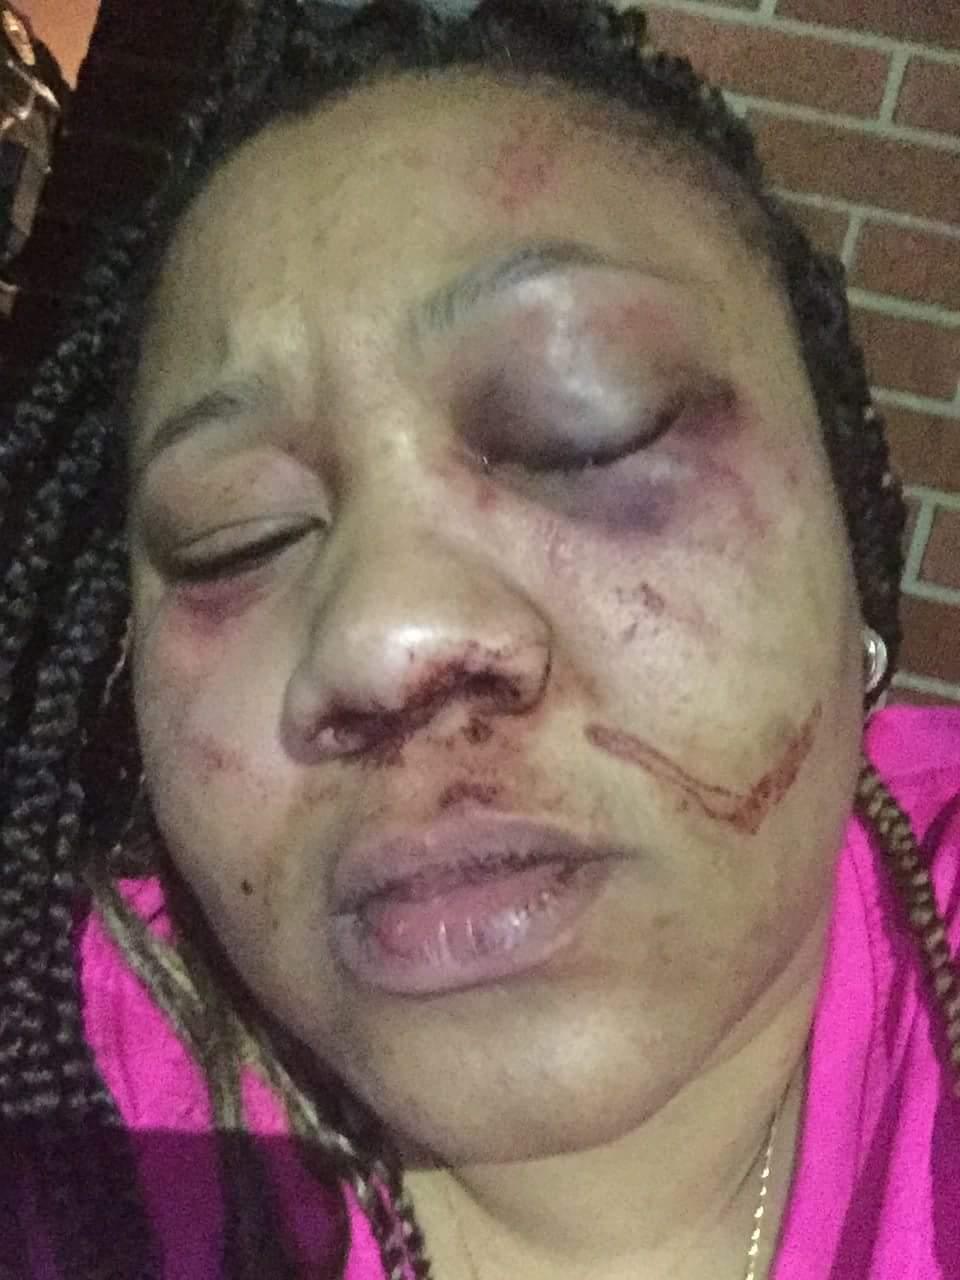 Pennsylvania Woman Janea Alston-Goggins Almost Beaten To Death By Her Fiance (3)